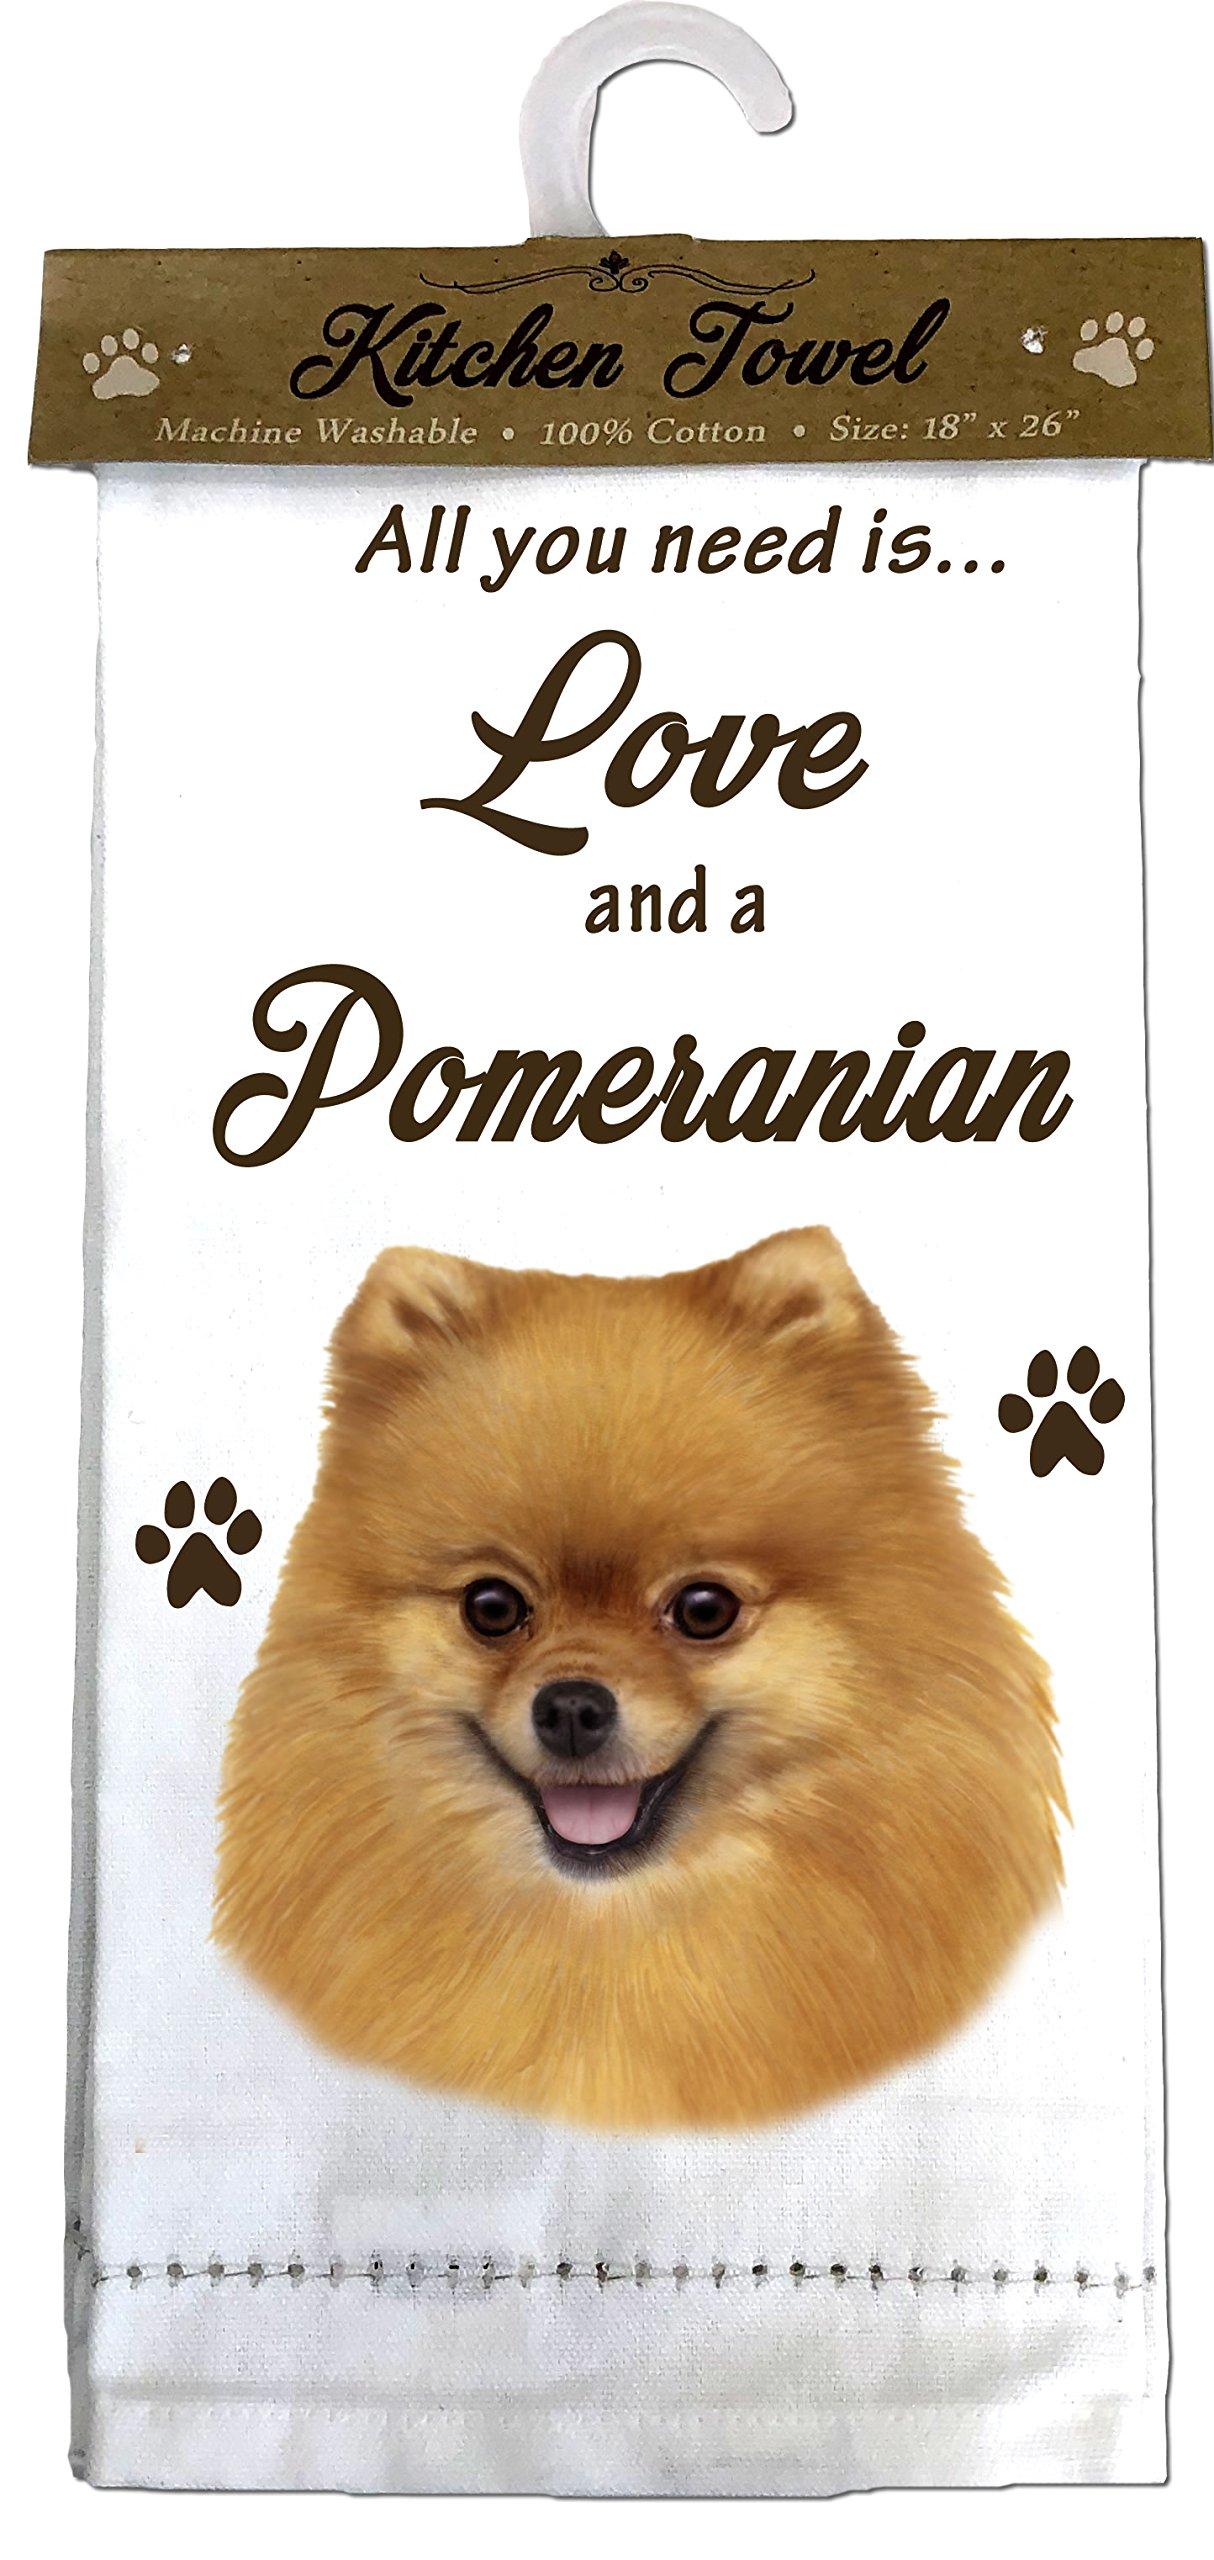 E&S Pets 700-27 Pomeranian Kitchen Towels, Off- Off-white 1